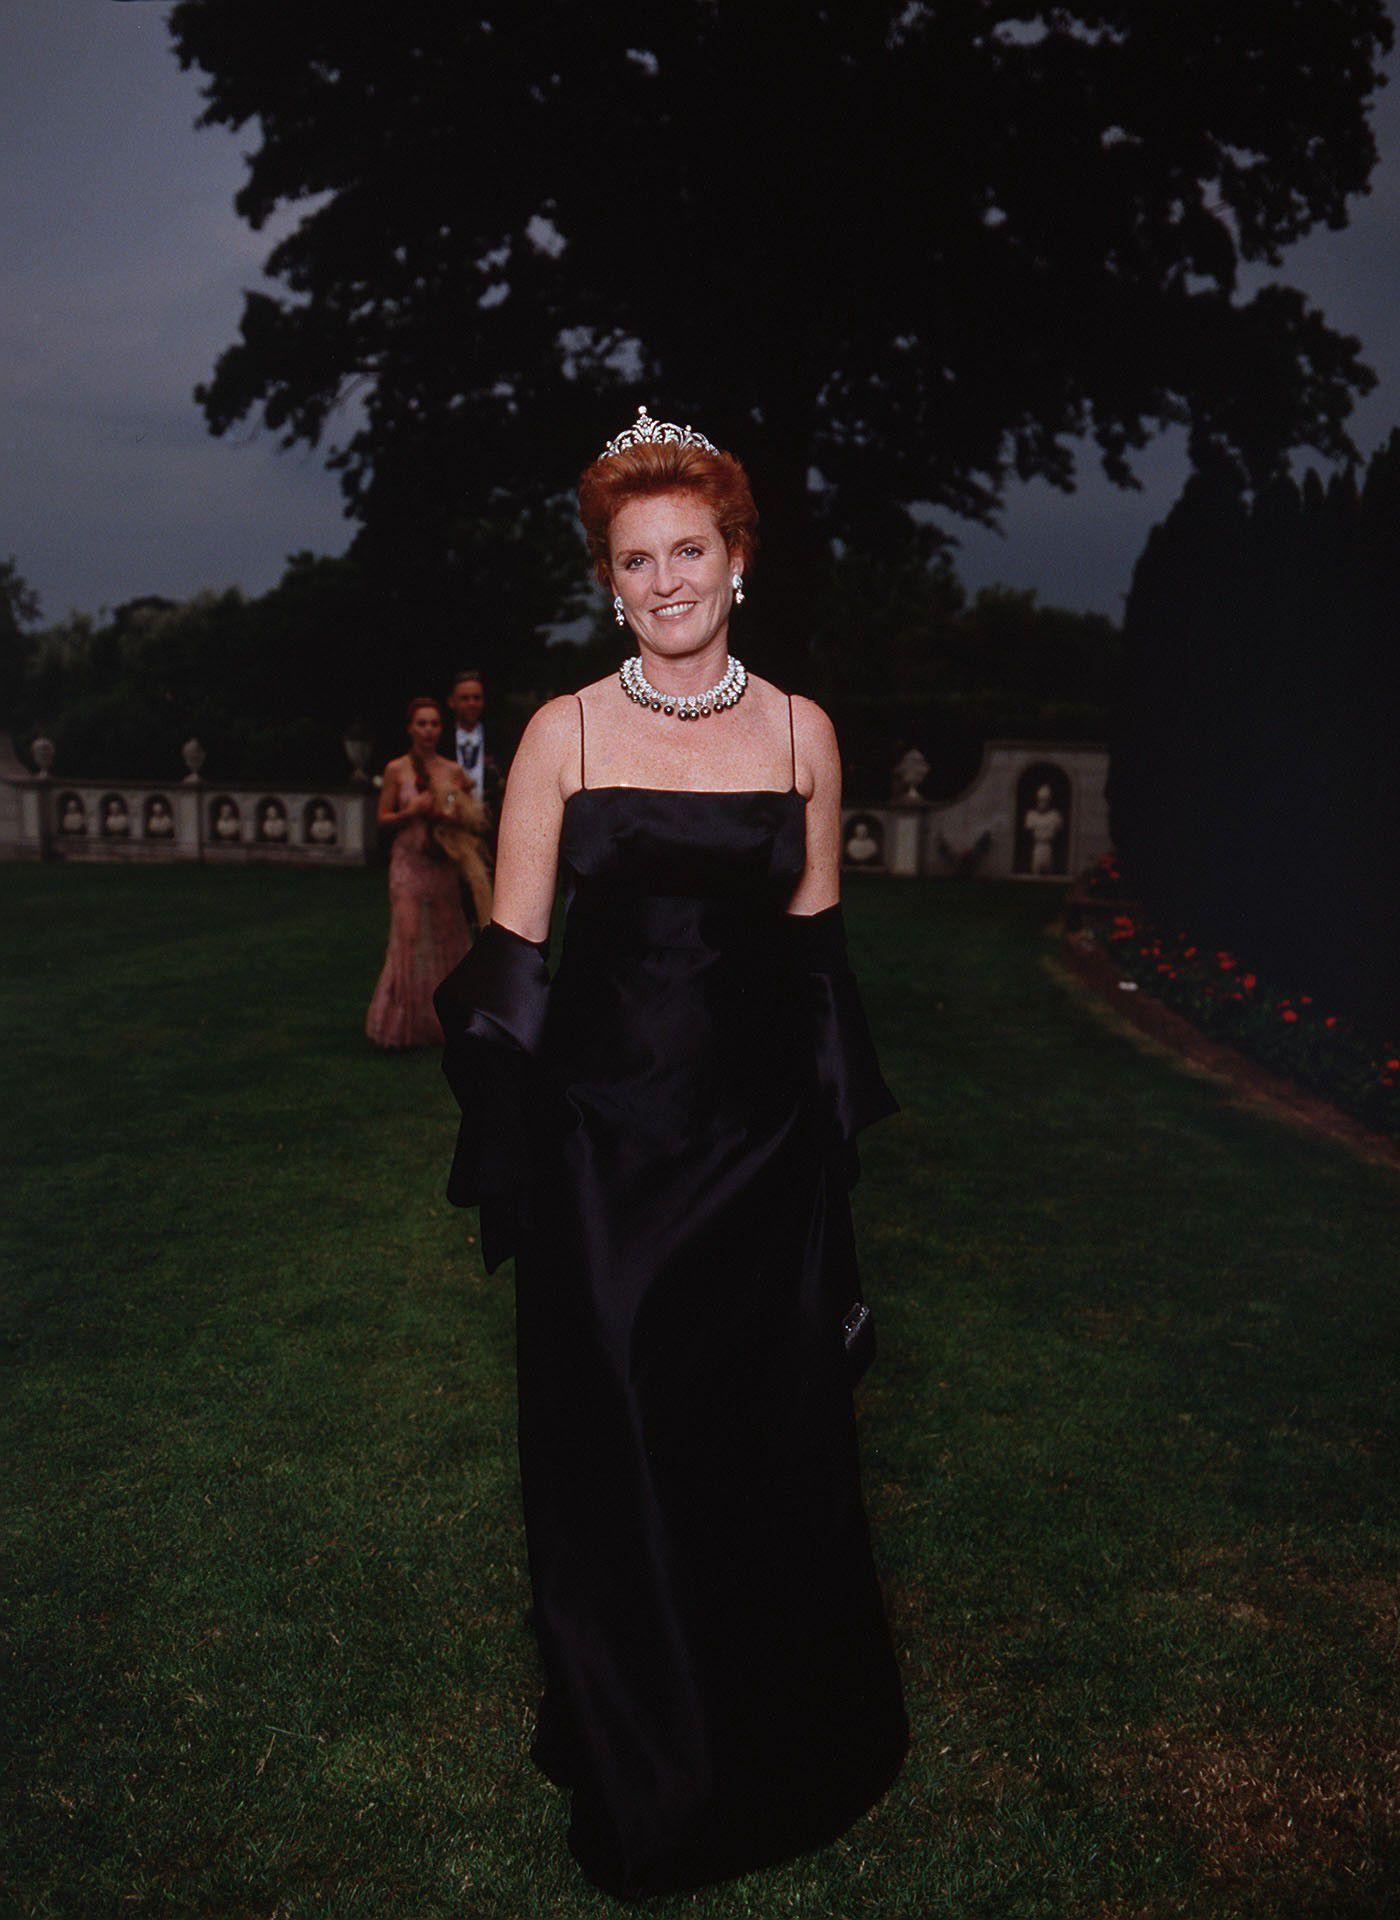 The Fascinating Story Behind Sarah Ferguson's Wedding